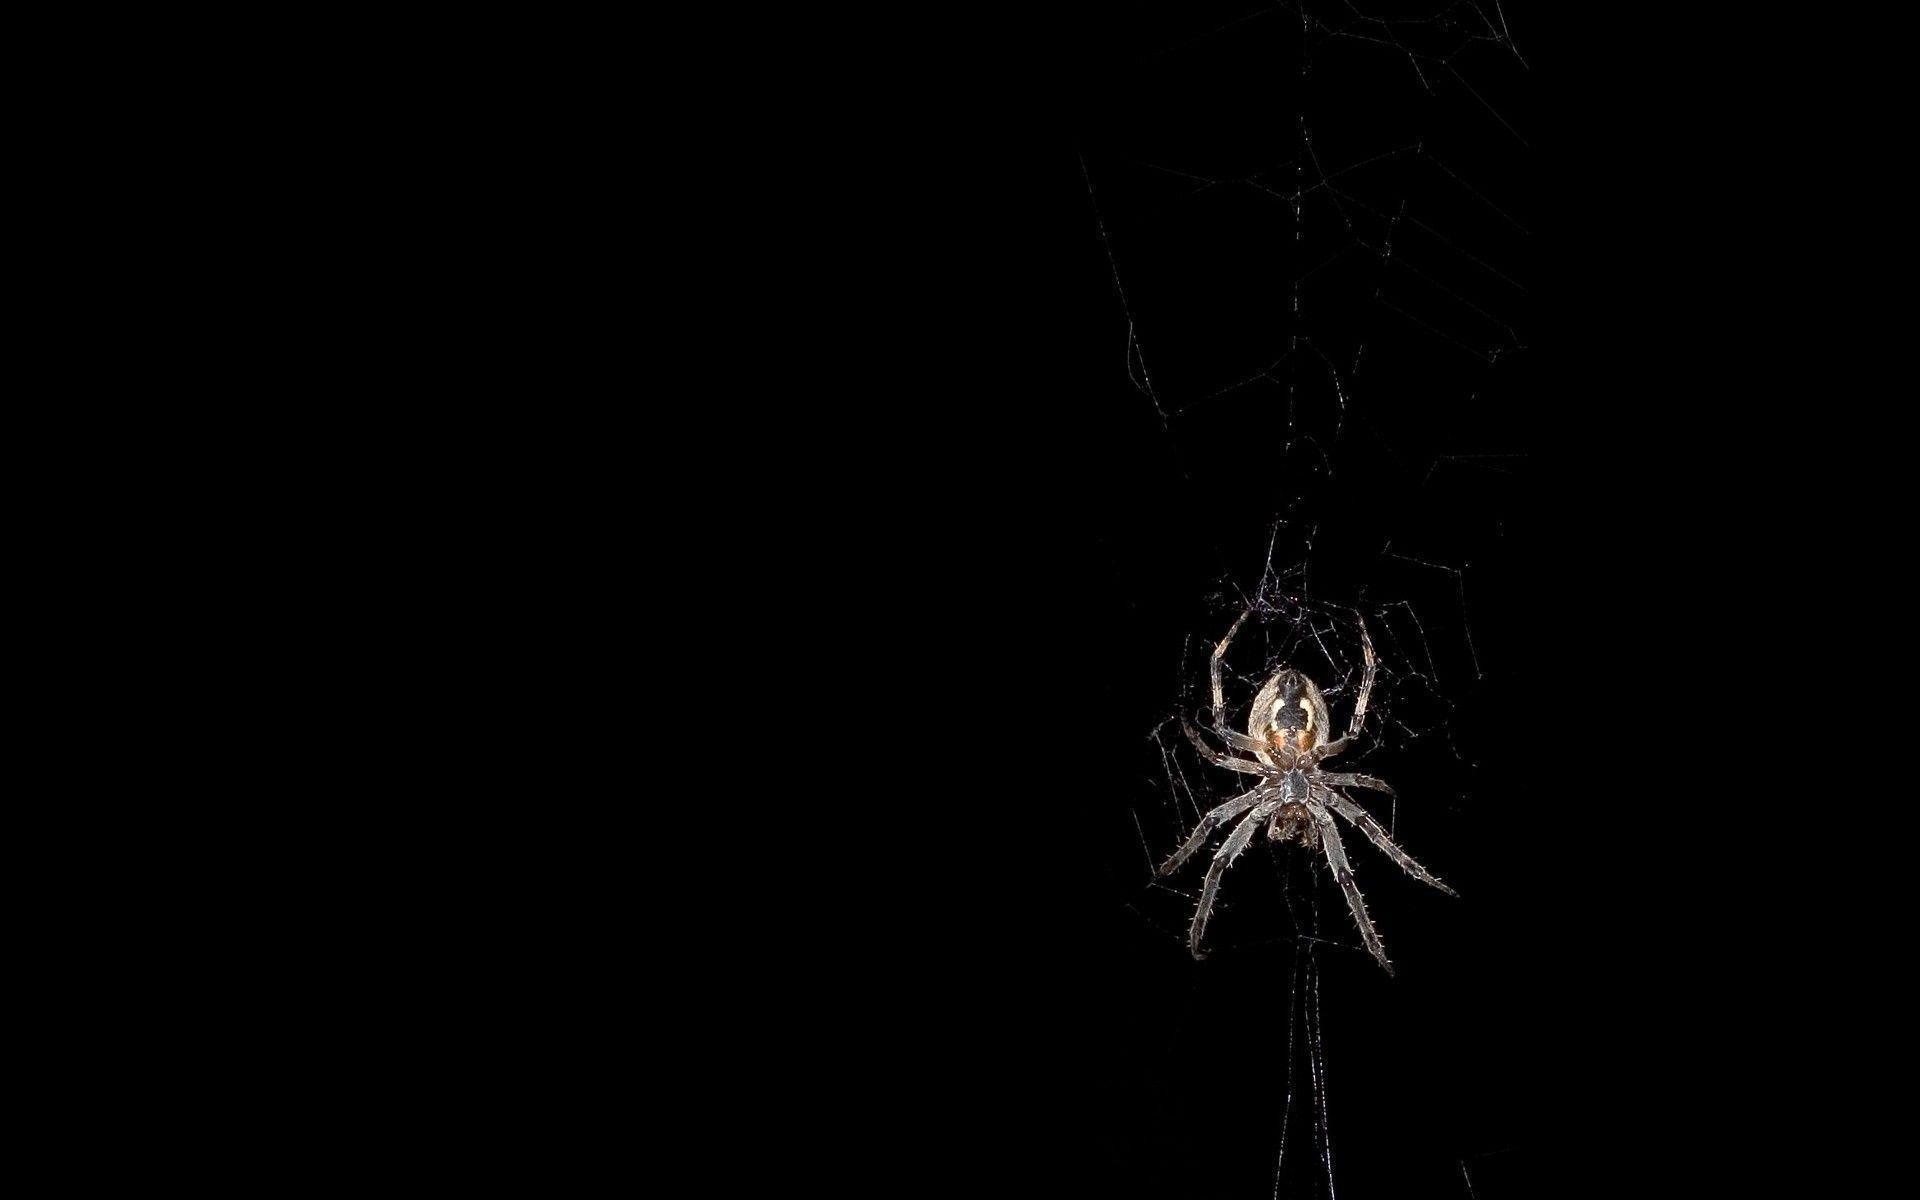 Spider Web – wallpaper.